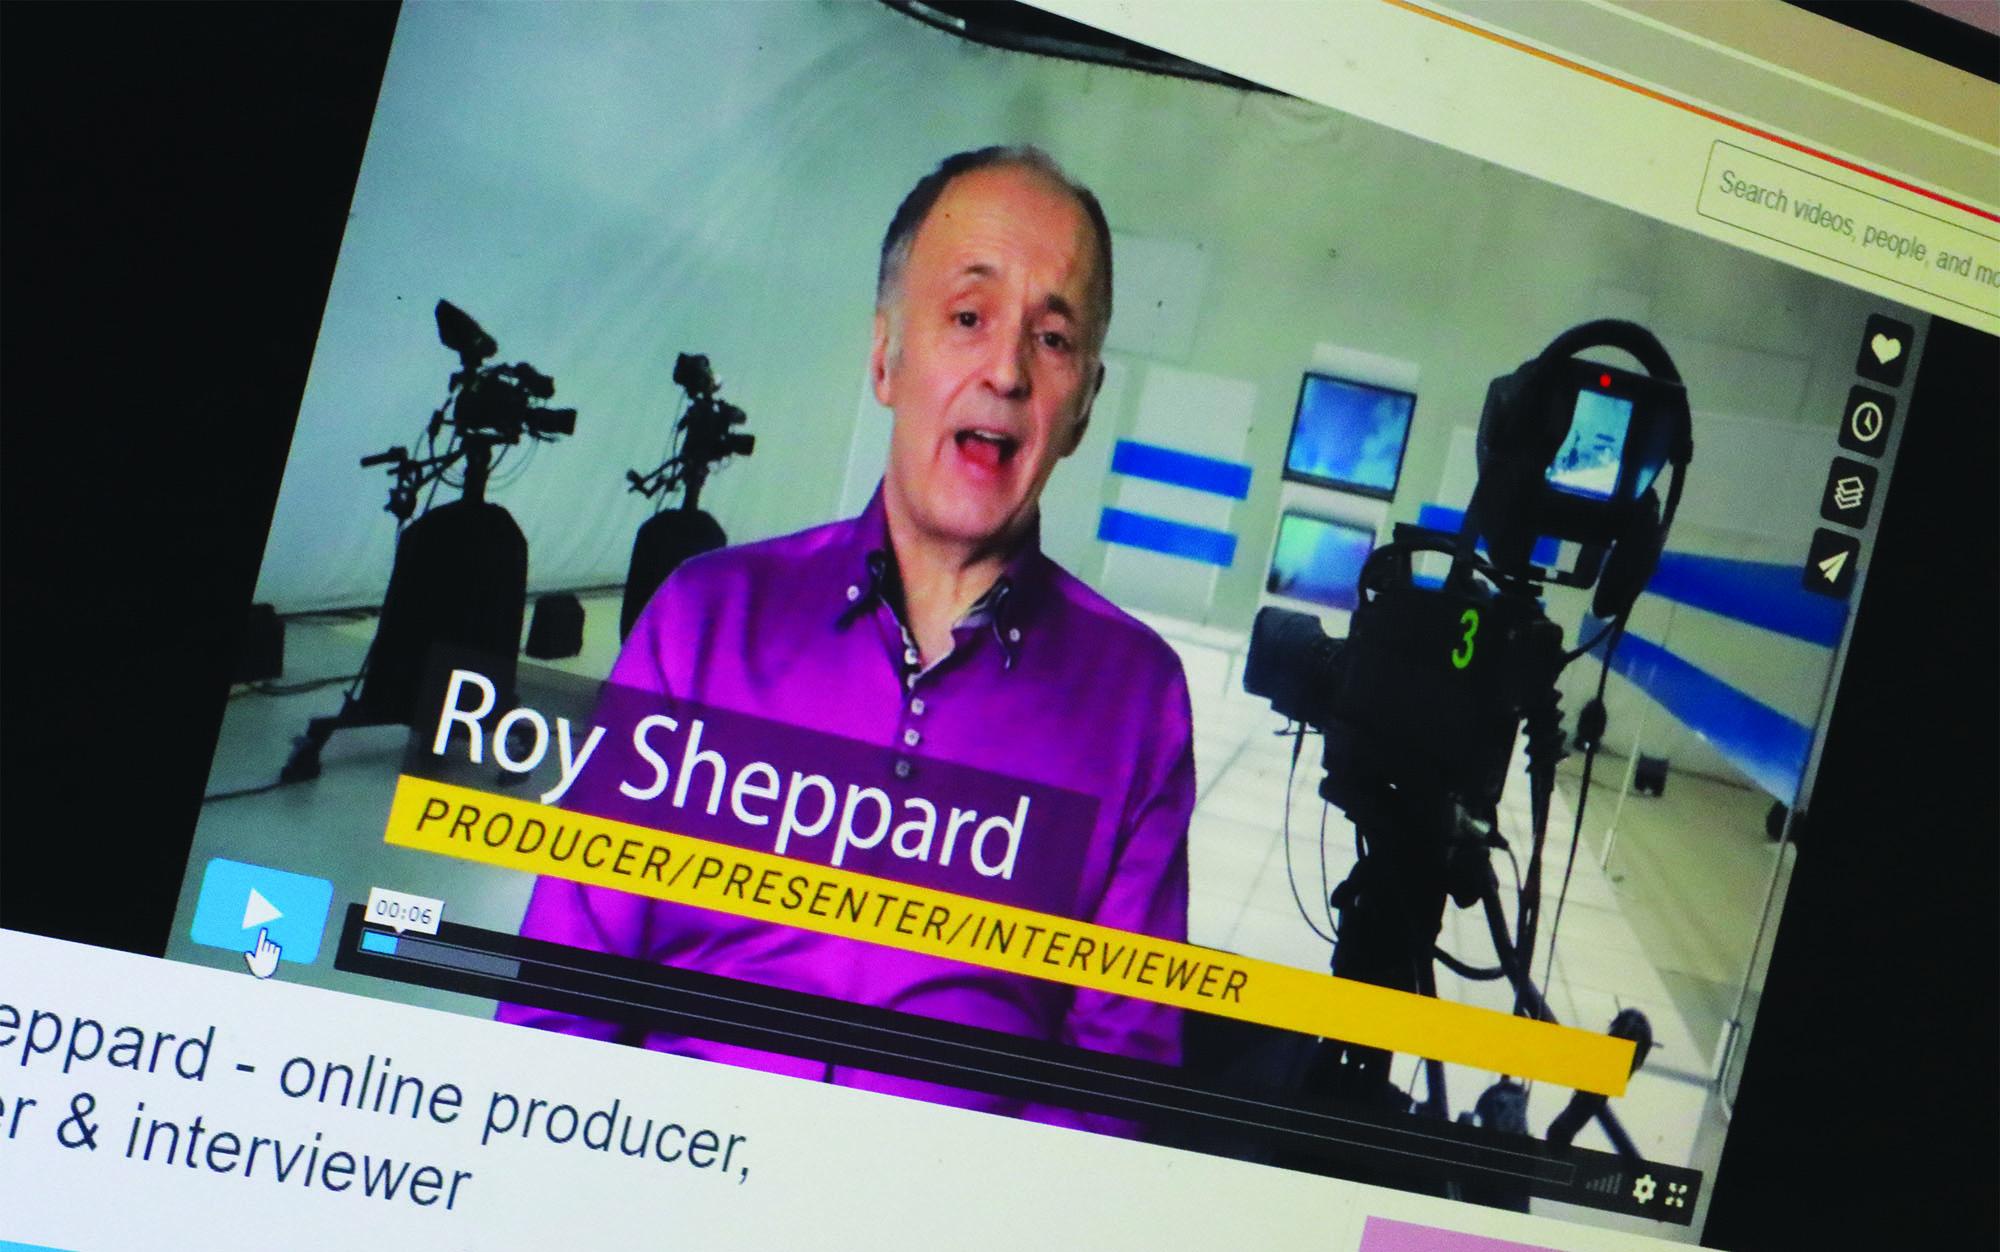 Roy Sheppard on-screen